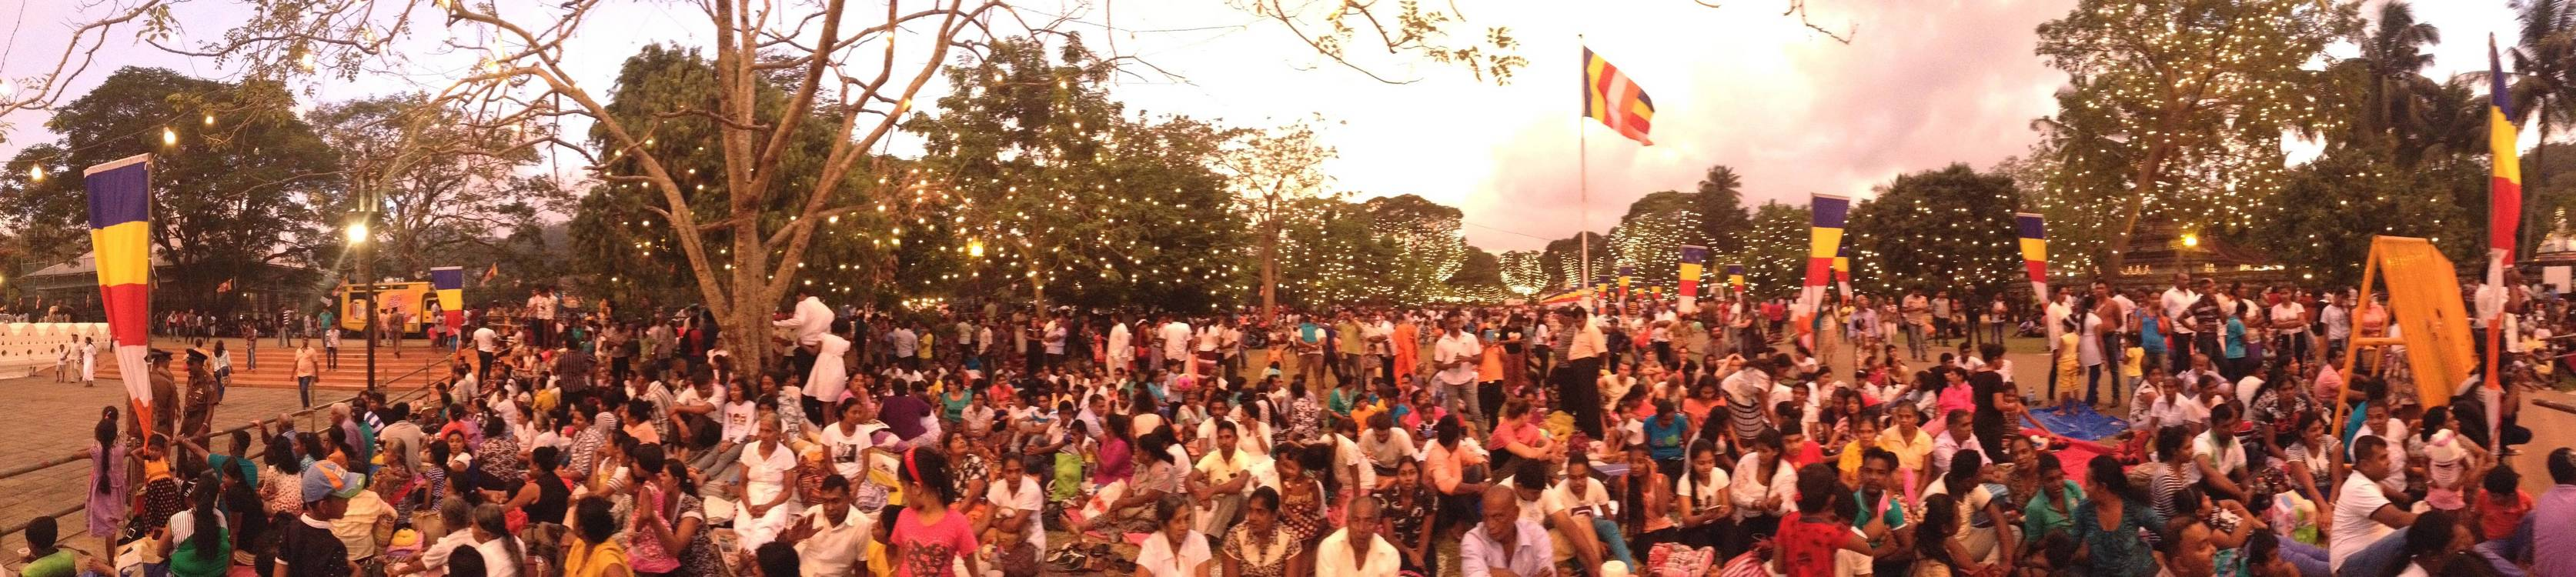 festival kandy sri lanka